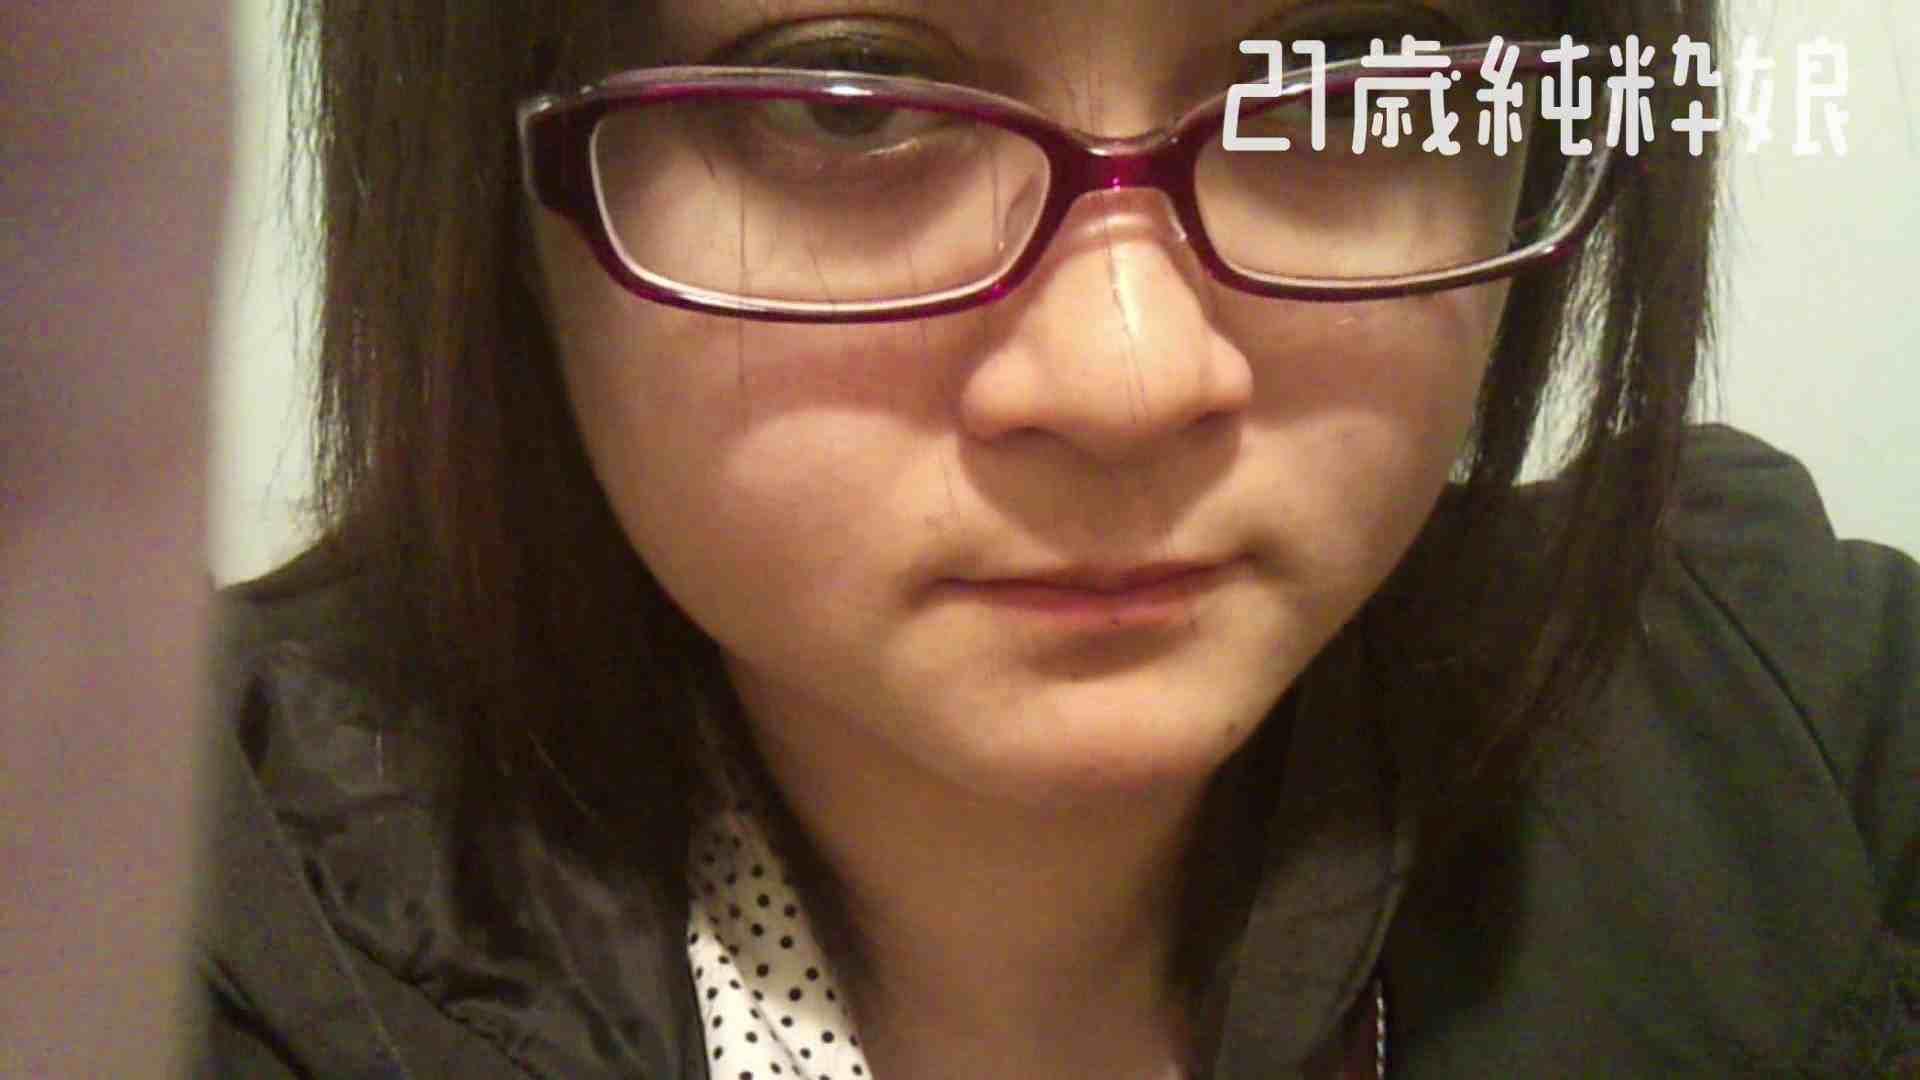 Gカップ21歳純粋嬢第2弾Vol.5 学校 オメコ動画キャプチャ 77pic 68